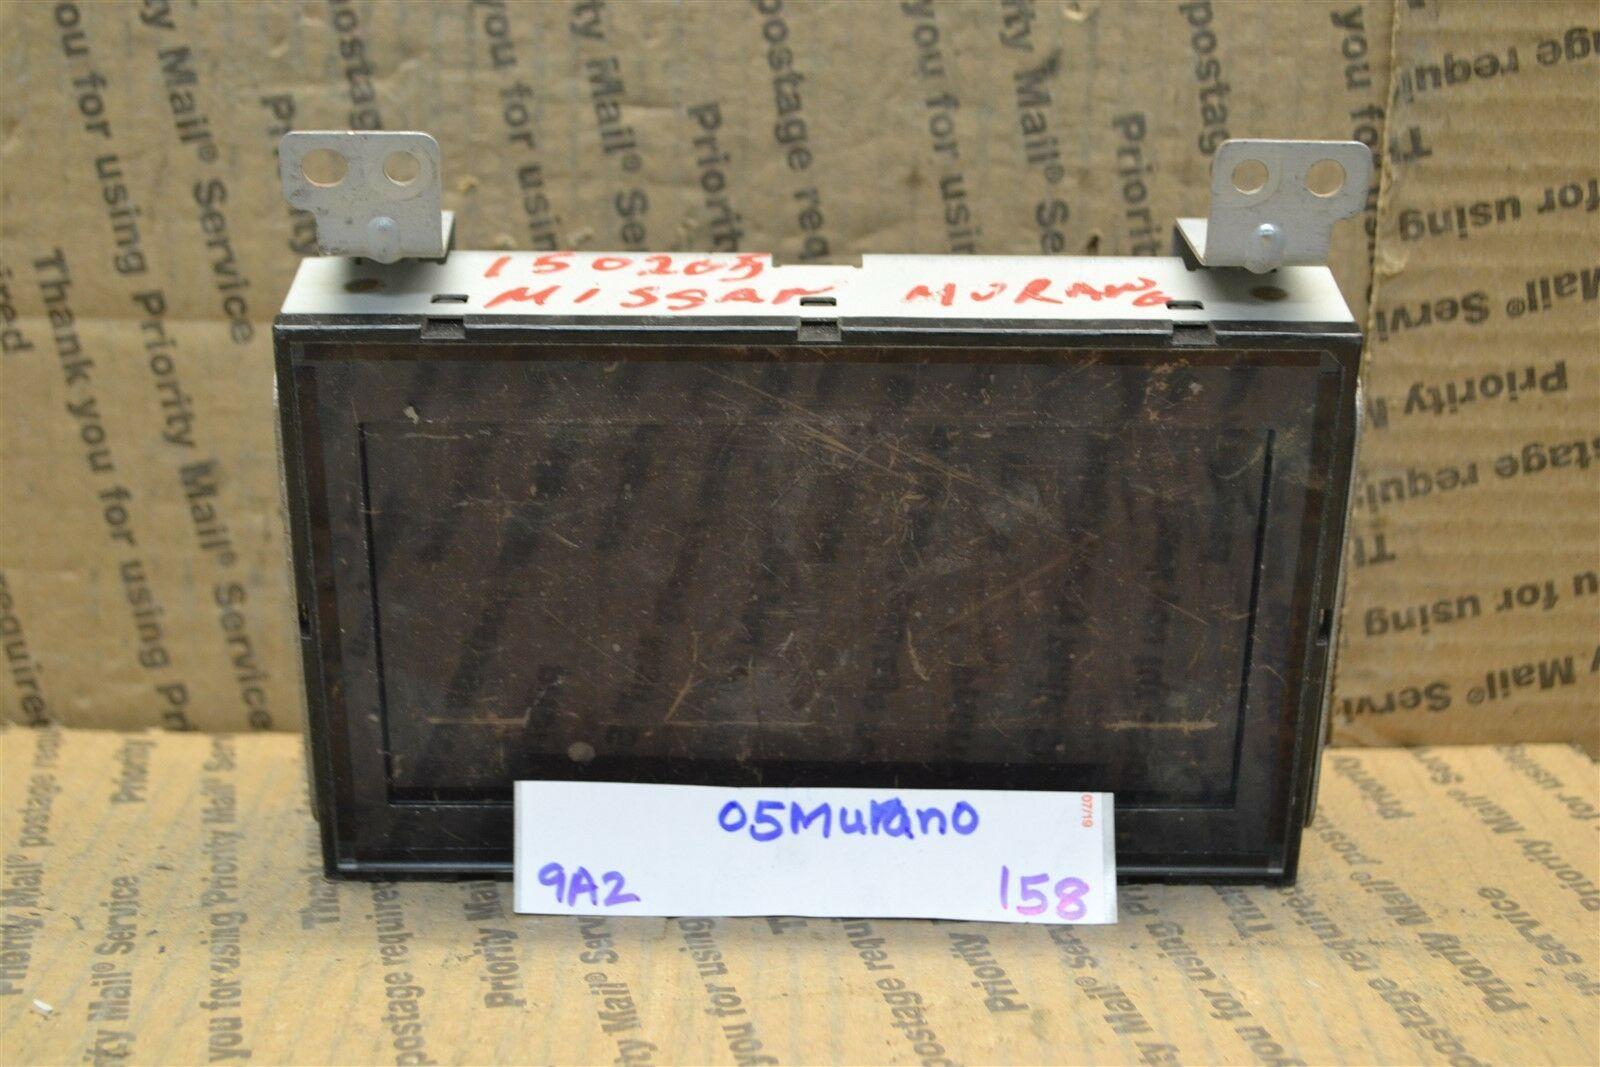 2005 Nissan Murano Dash information Display Screen 28090CB800 OEM 158-9A2 - $13.99